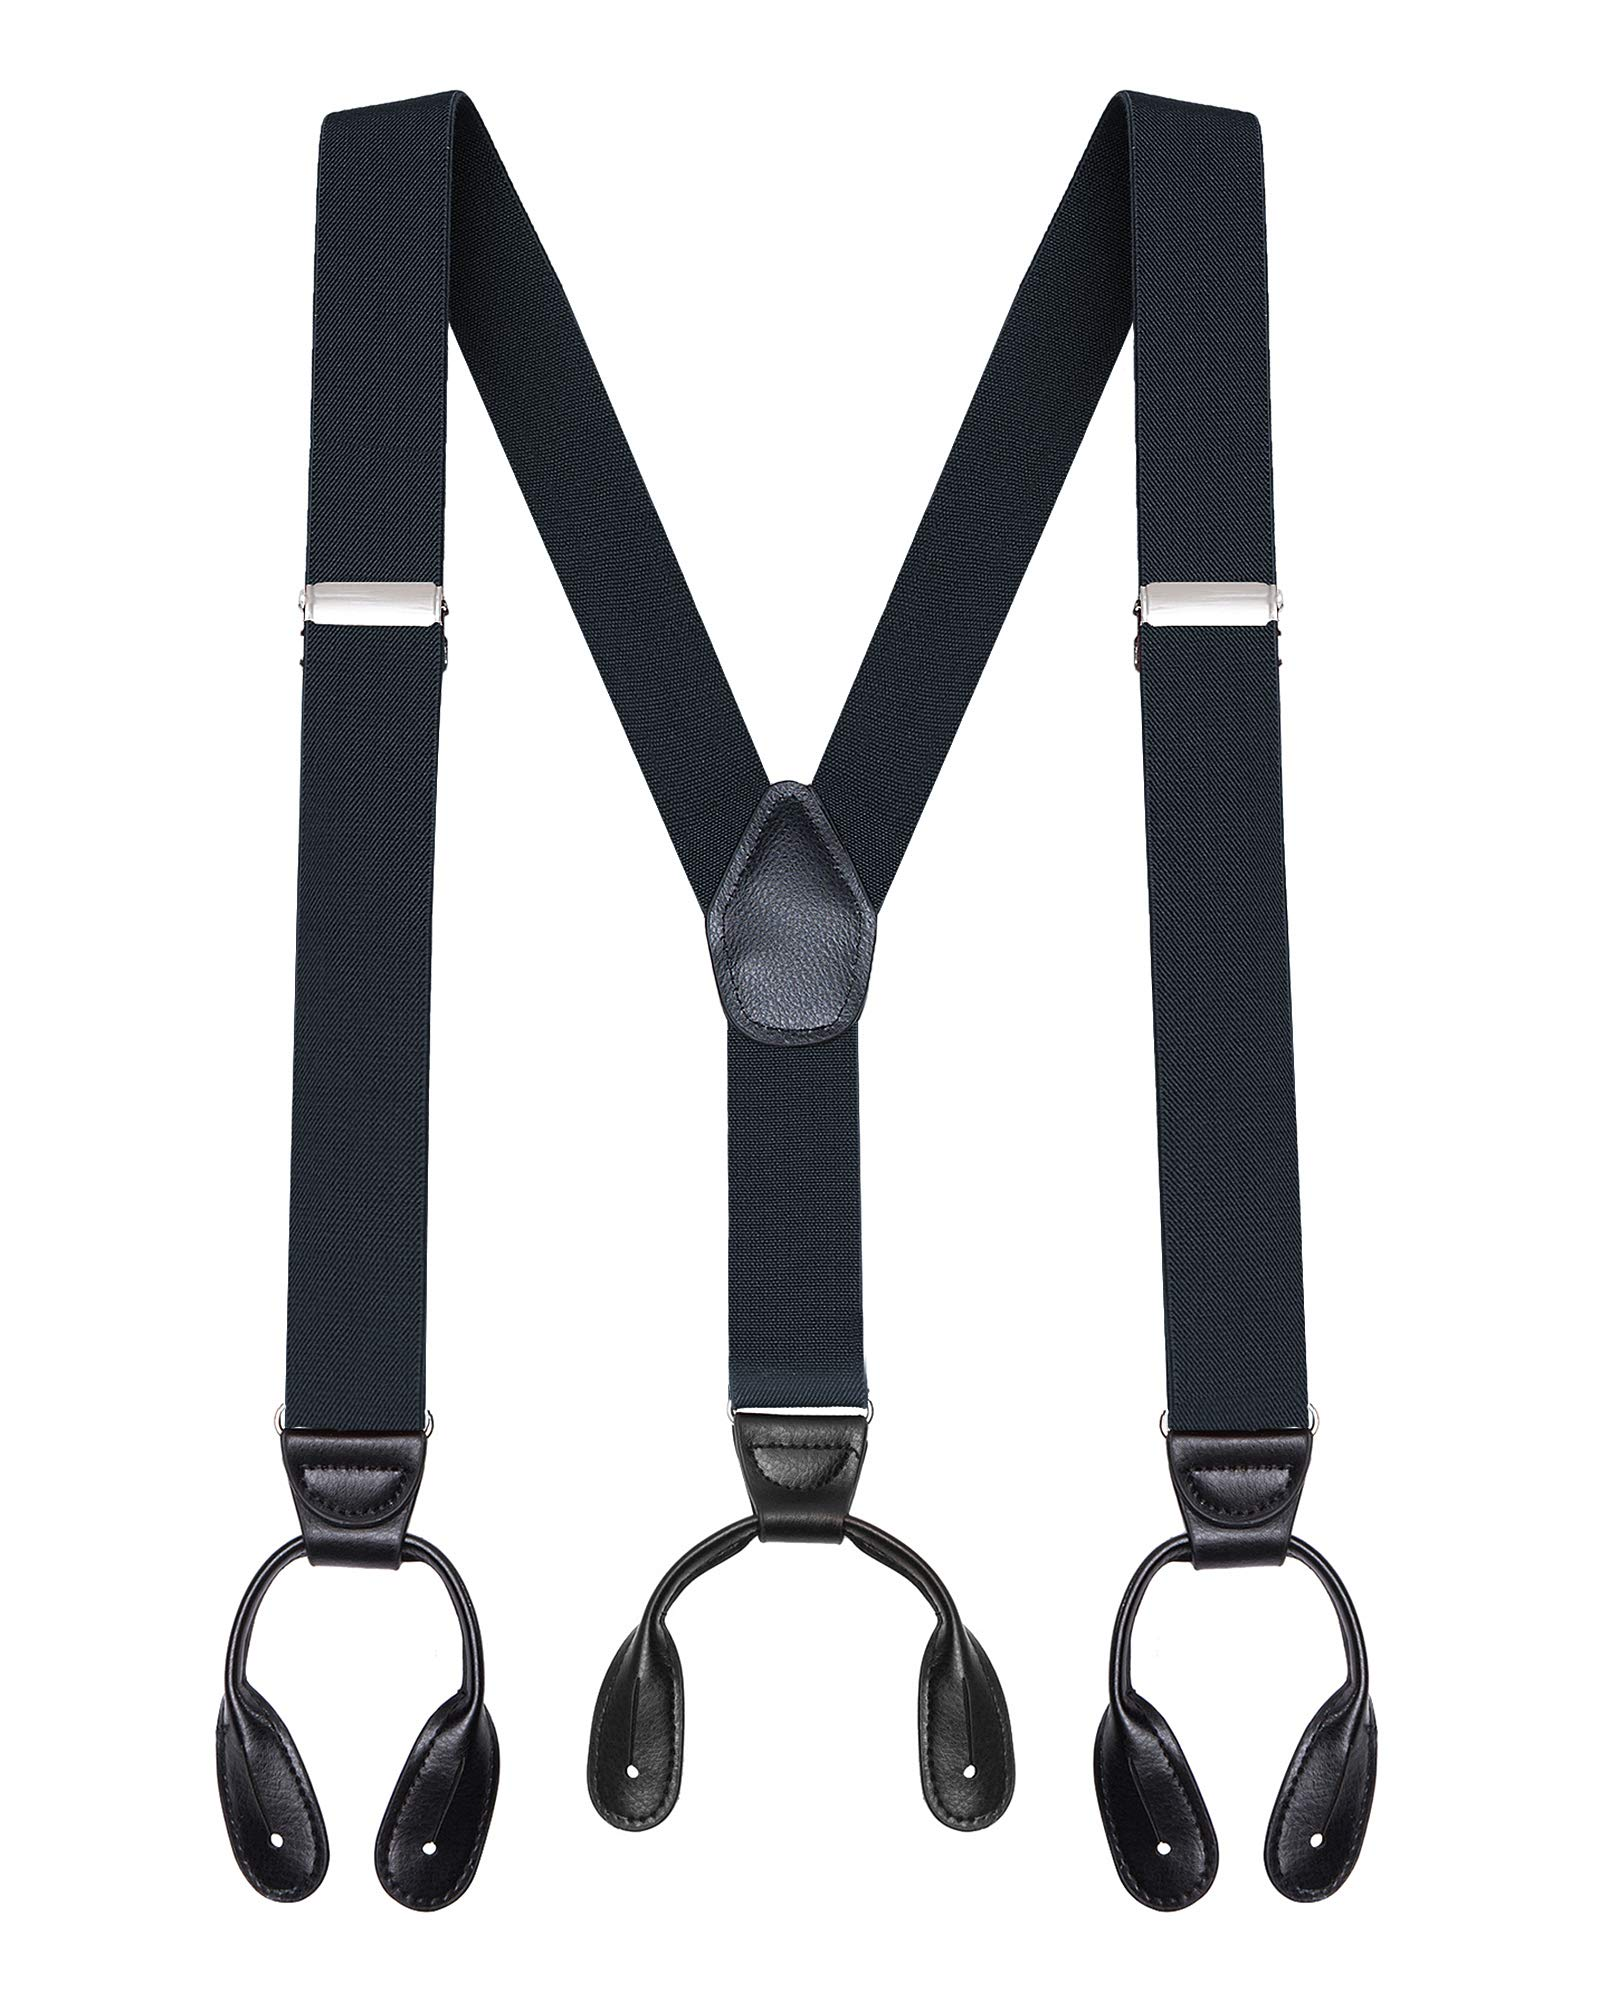 Ruler Print Custom LeatherCraft 110RUL Heavy Duty Tape Rule Elastic Suspenders